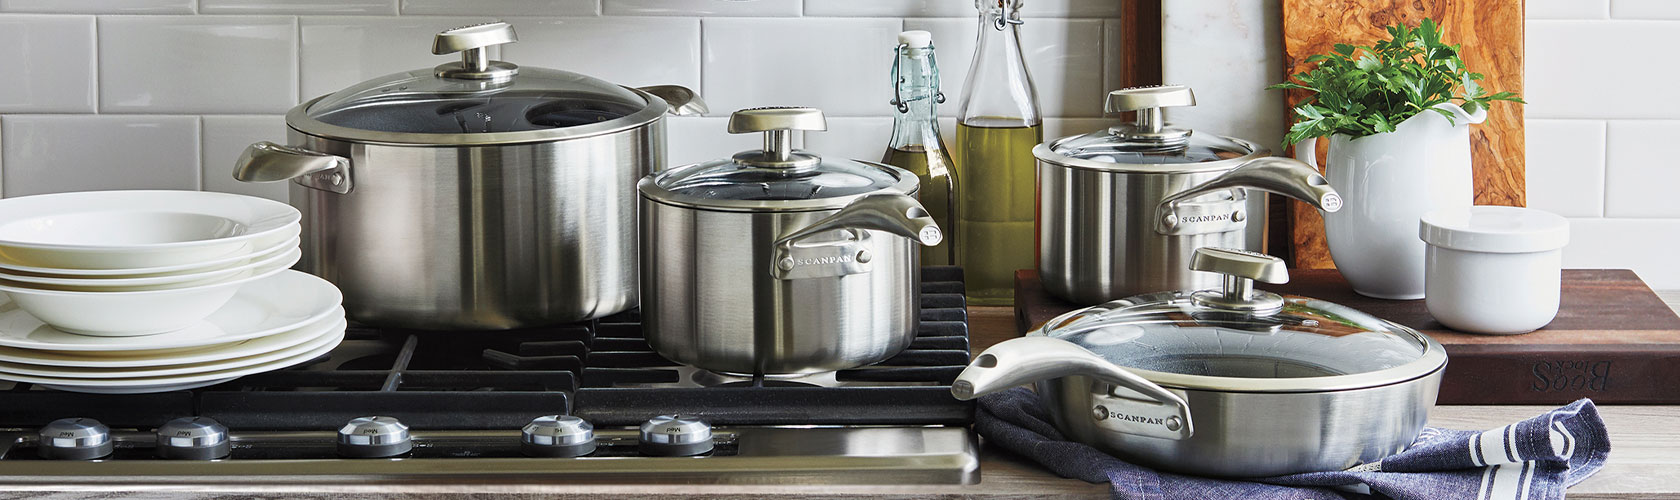 Scanpan cookware set on cooktop